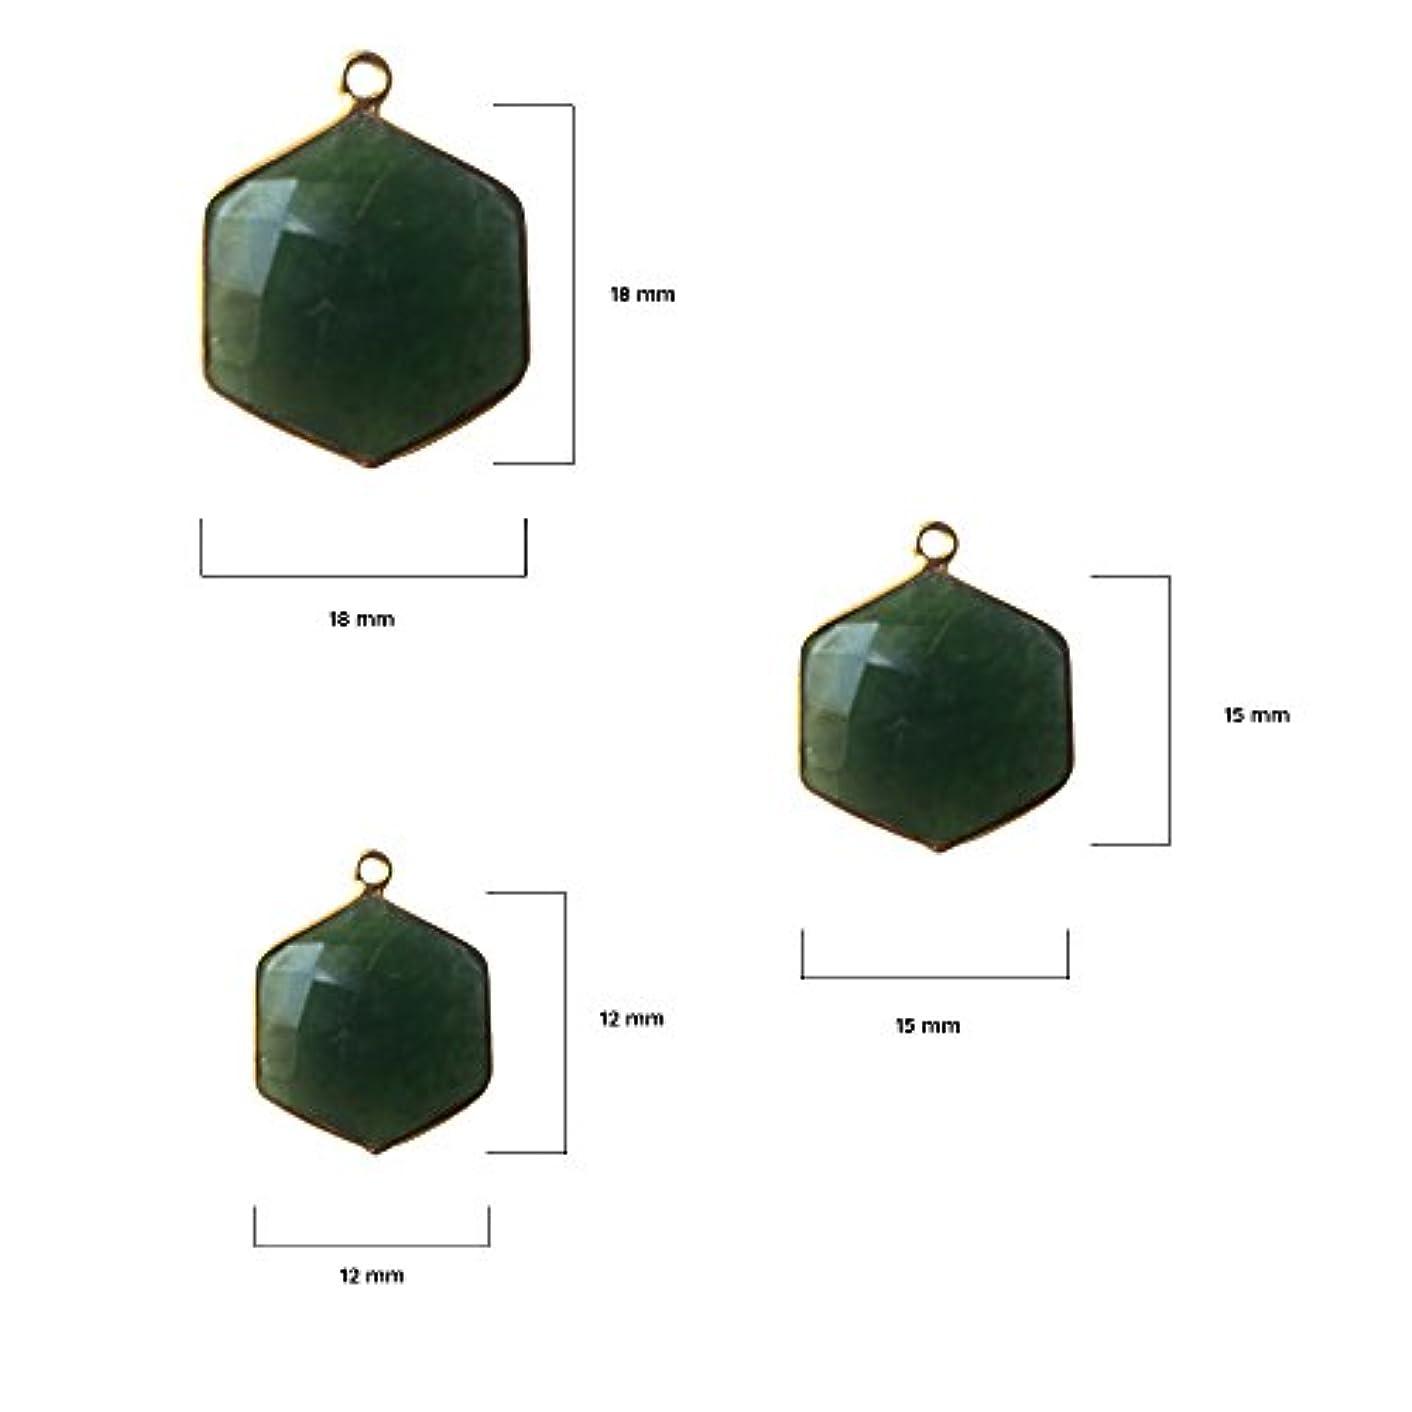 2 Pcs Natural Serpentine Hexagon Beads 12mm 24K Gold Vermeil by BESTINBEADS, Natural Serpentine Hexagon Pendant Bezel Gemstone Connectors Over 925 Sterling Silver Bezel Jewelry Making Supplies